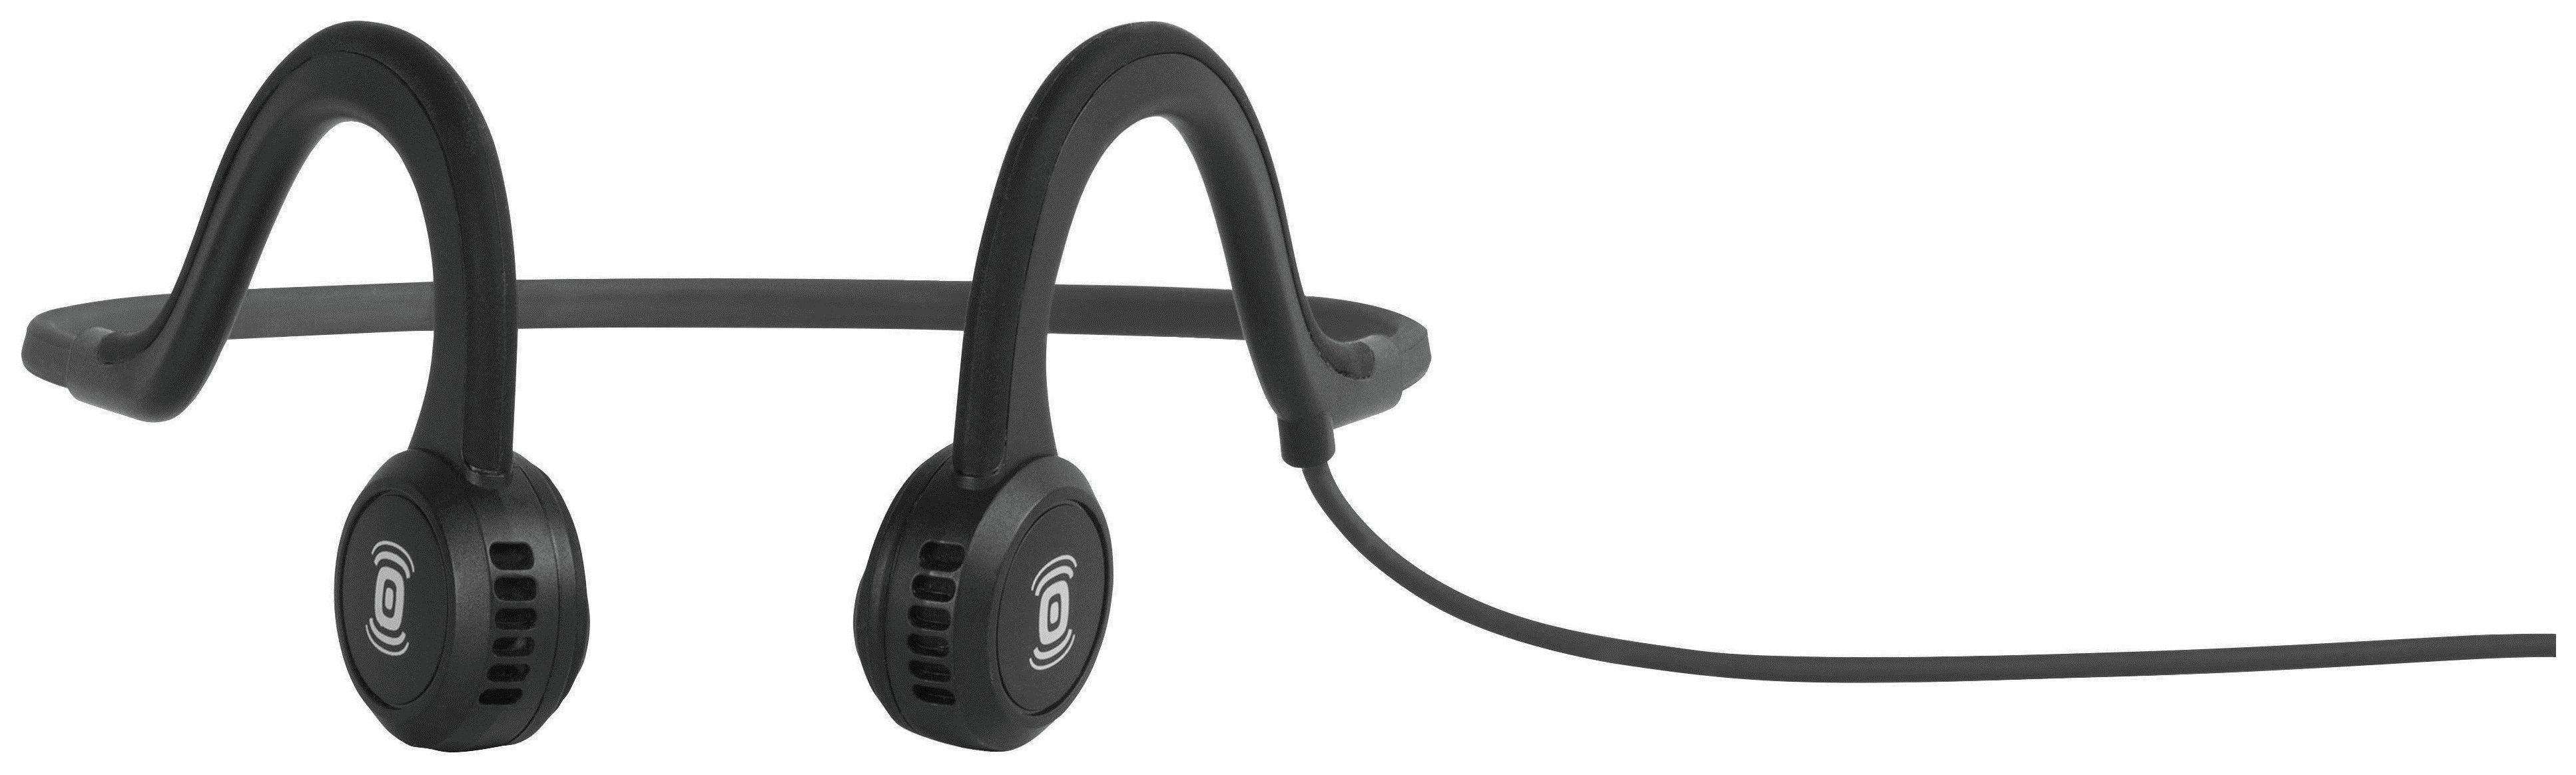 Image of Aftershokz Sportz In-Ear Sports Headphones - Black.